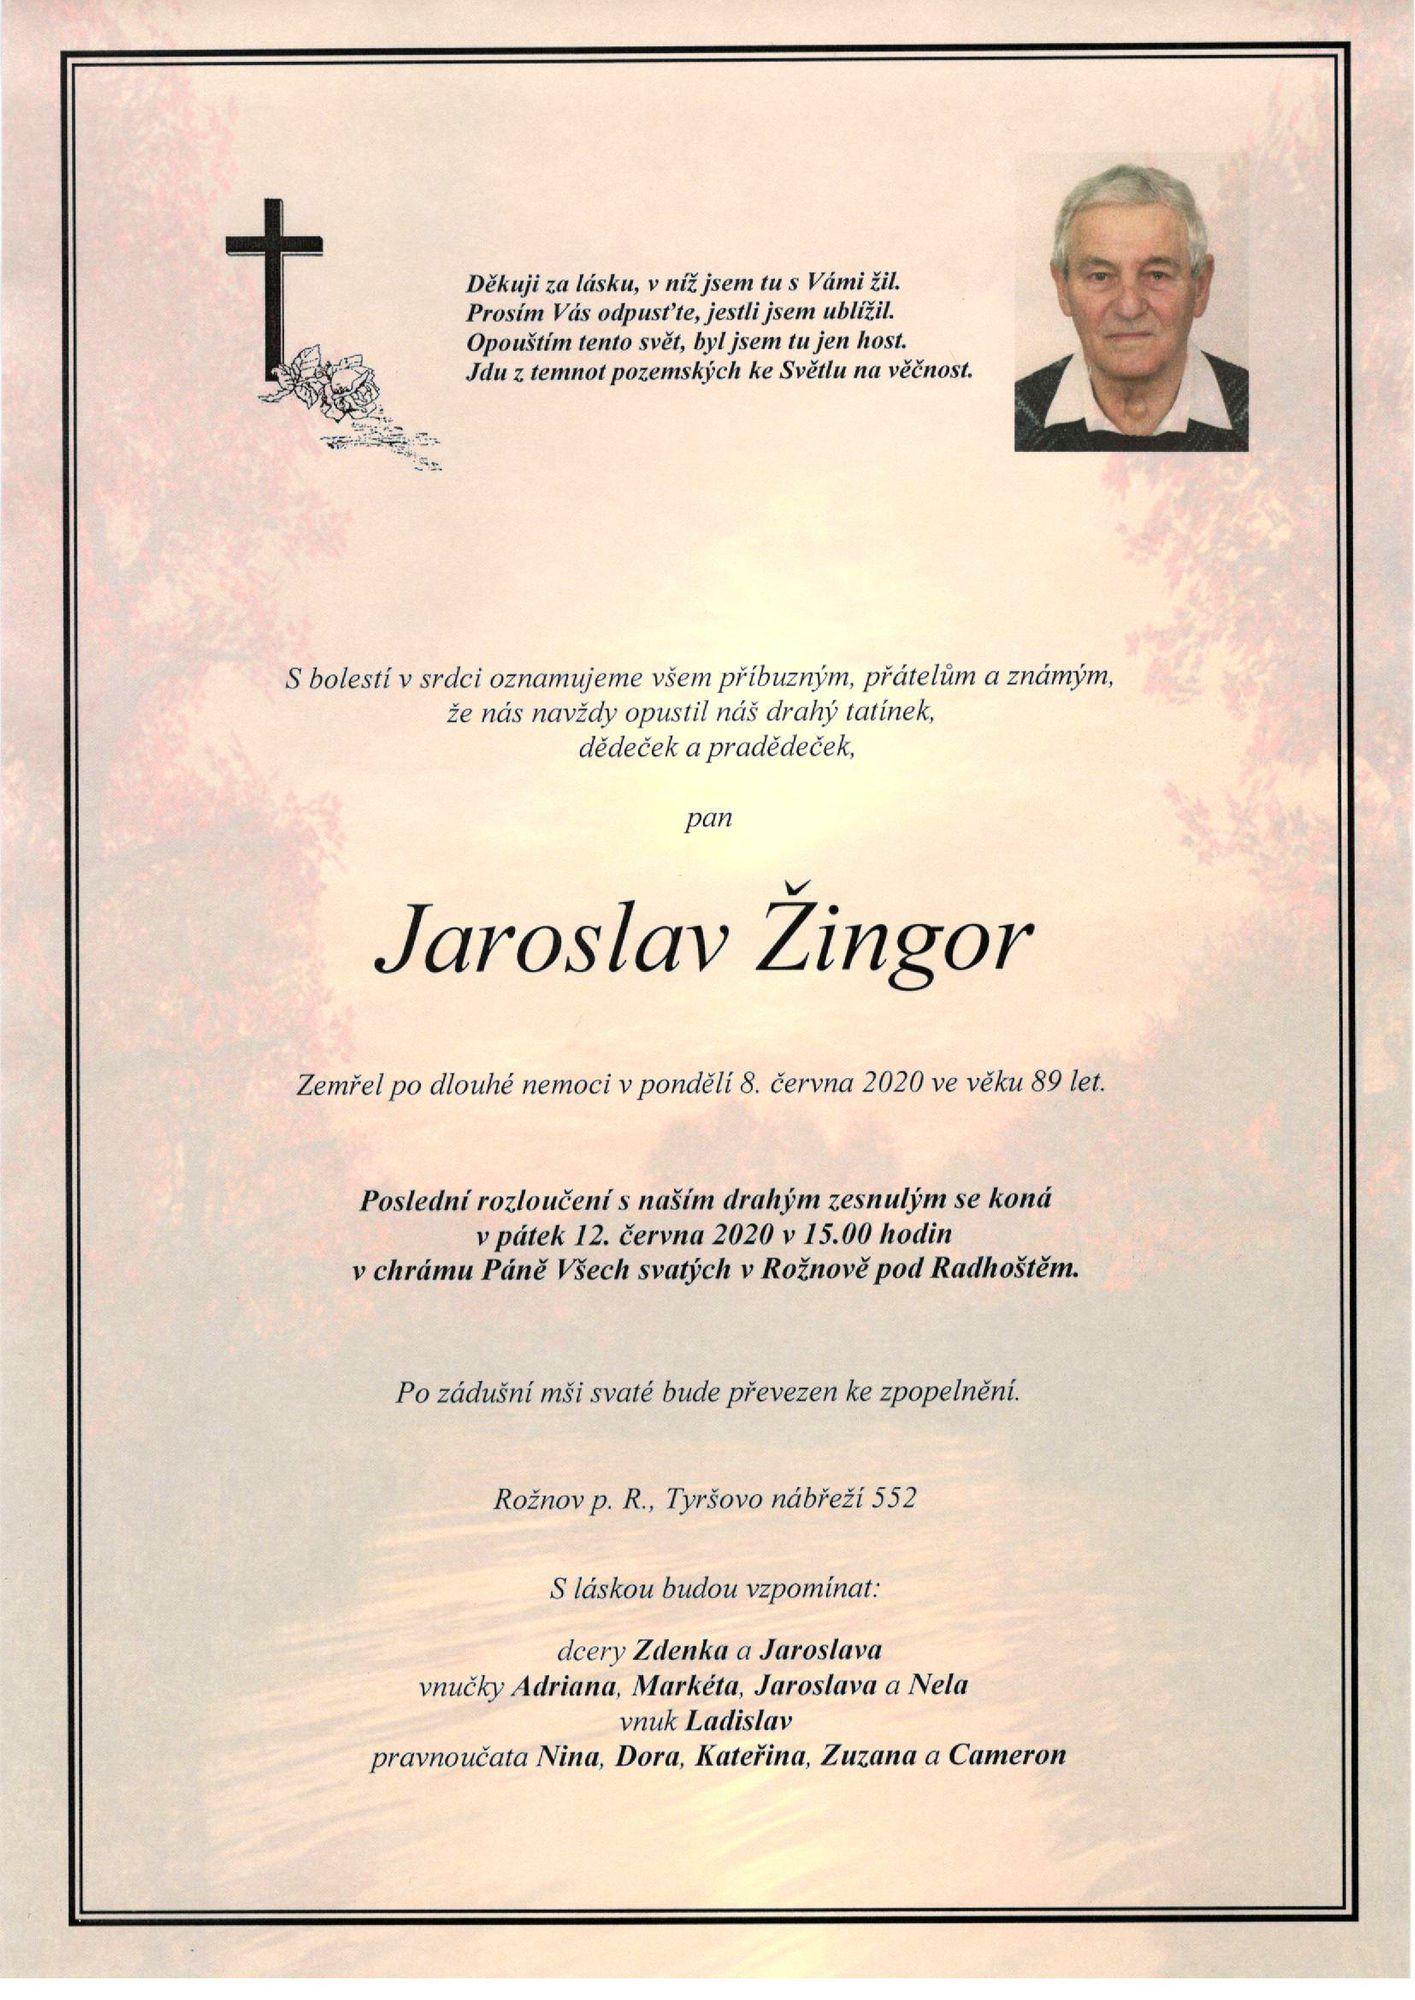 Jaroslav Žingor